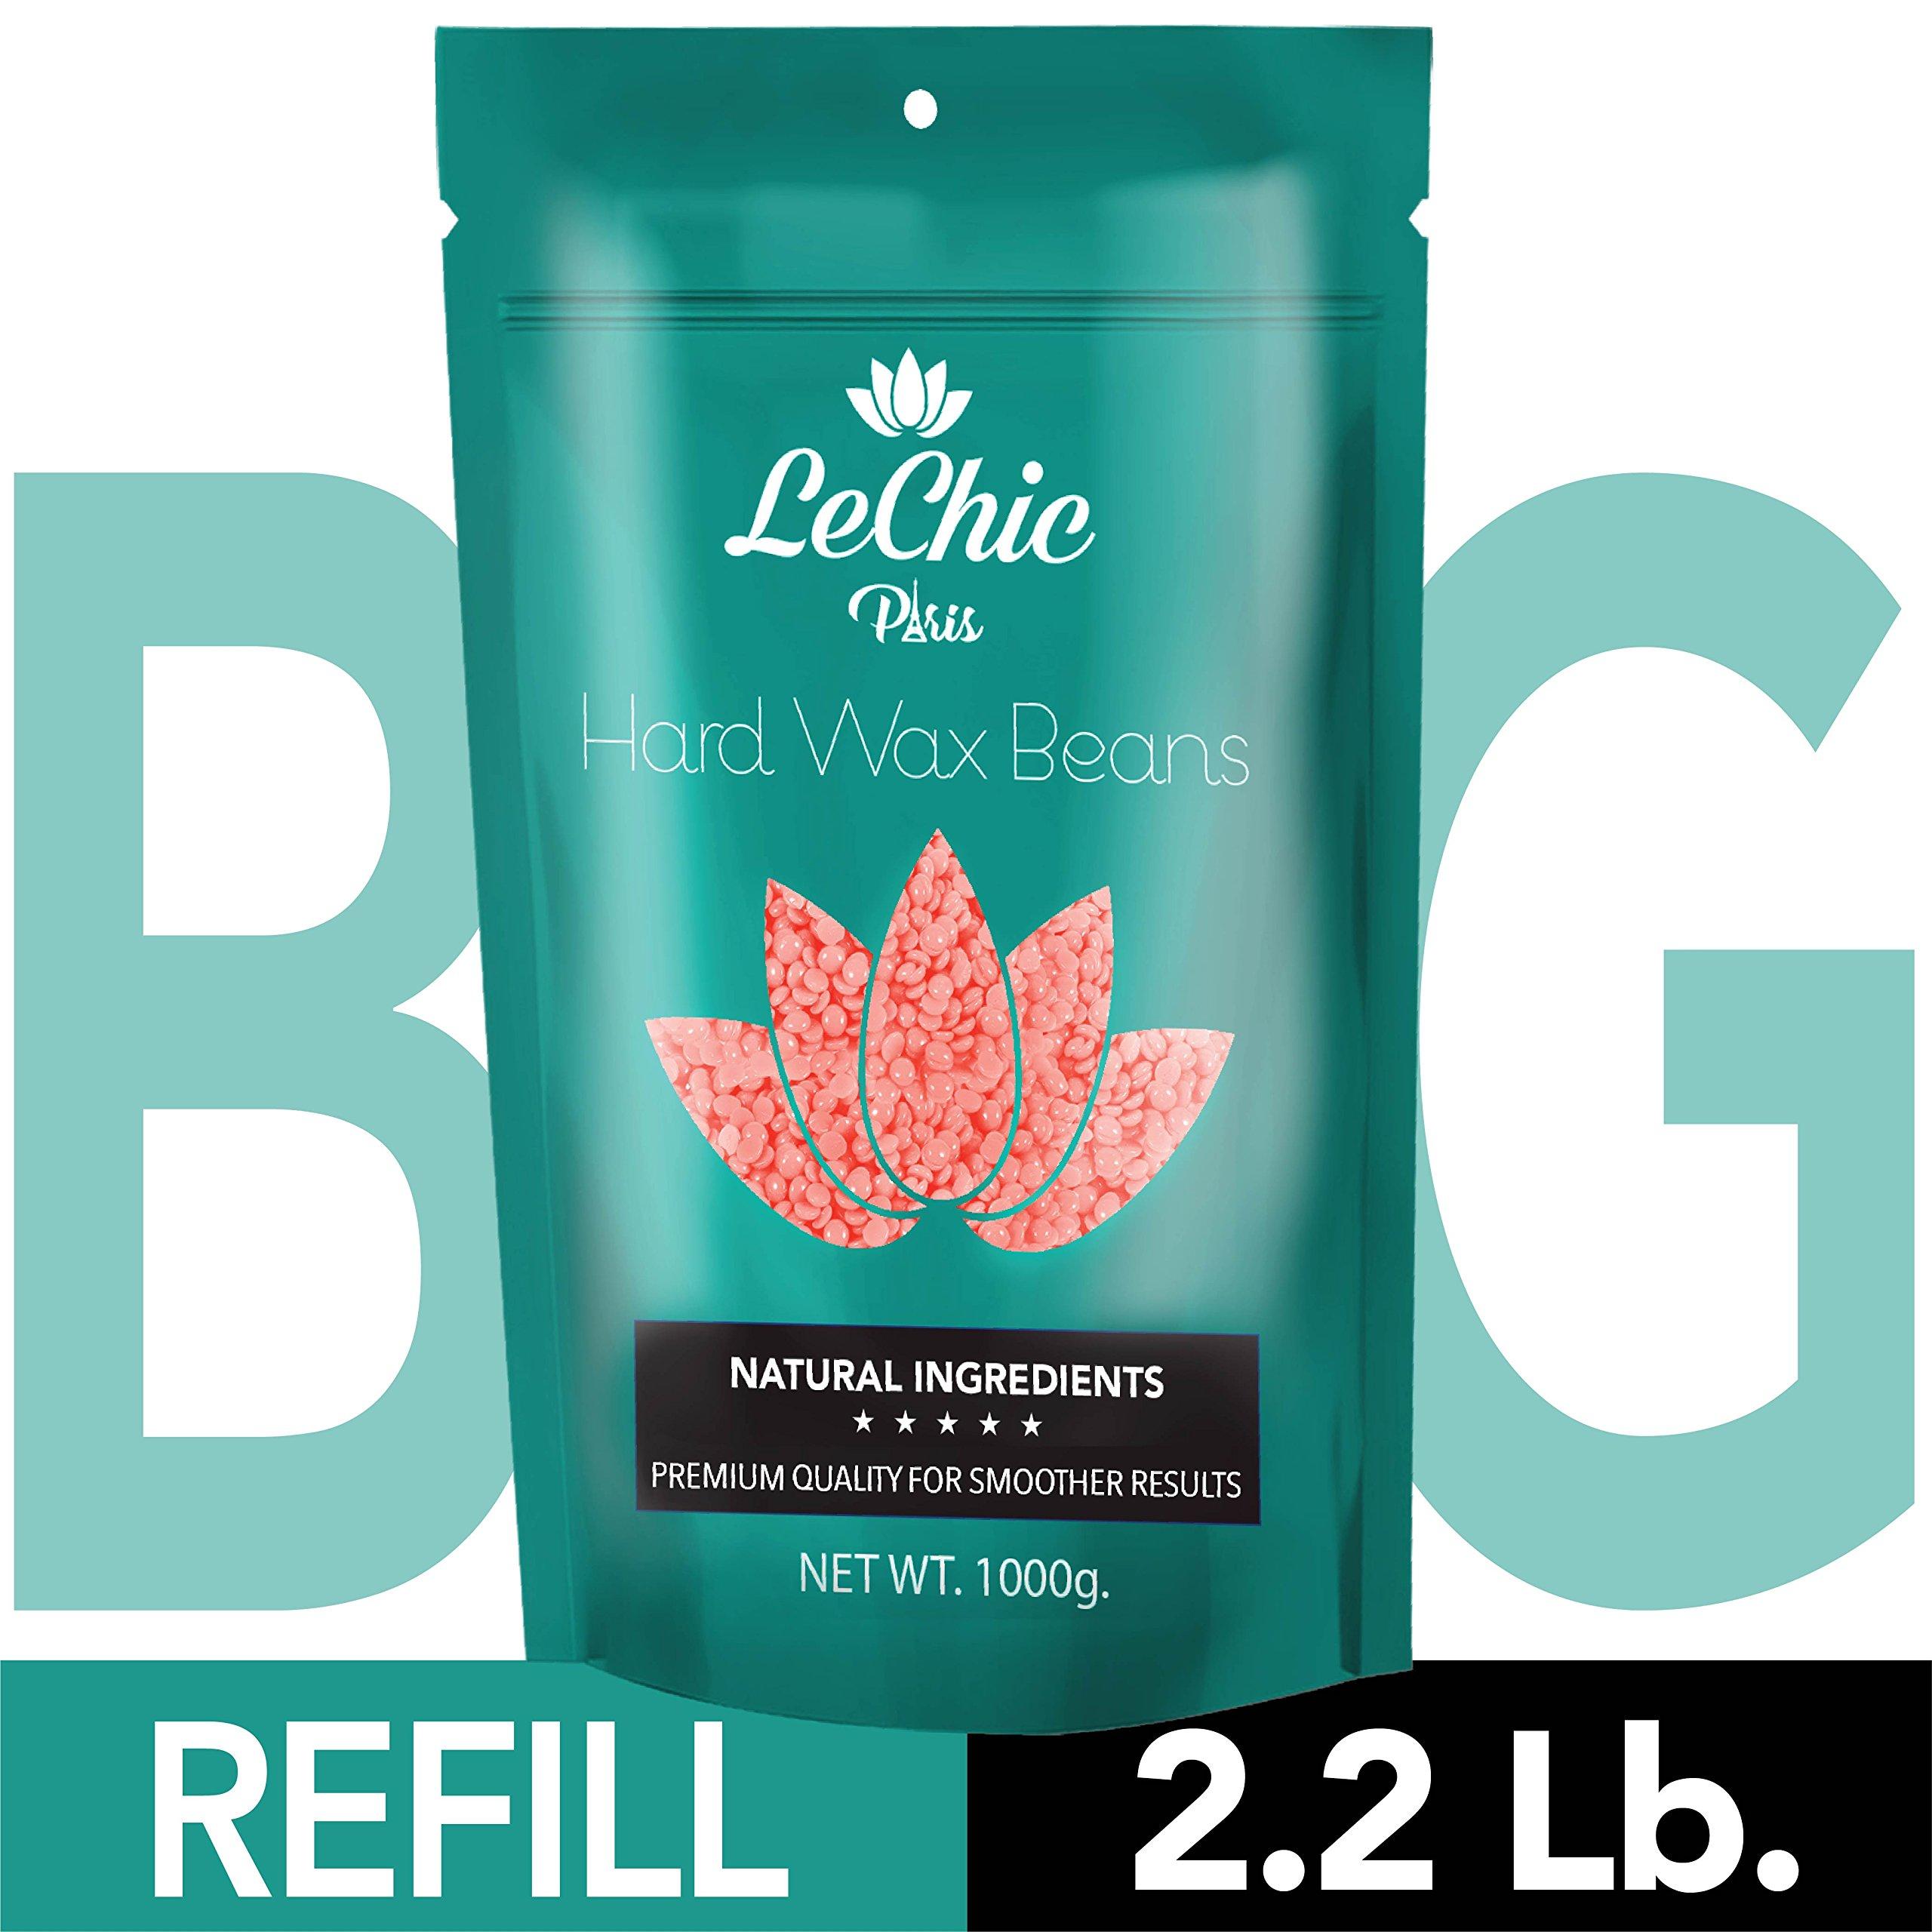 Wax Beans - Hard Wax Beans for Hair Removal - Brazilian Bikini Waxing - Pearl Wax - MEGA REFILL 35 oz. bag (2.2 LB) for Sensitive Body Skin by LeChic by LeChic (Image #9)